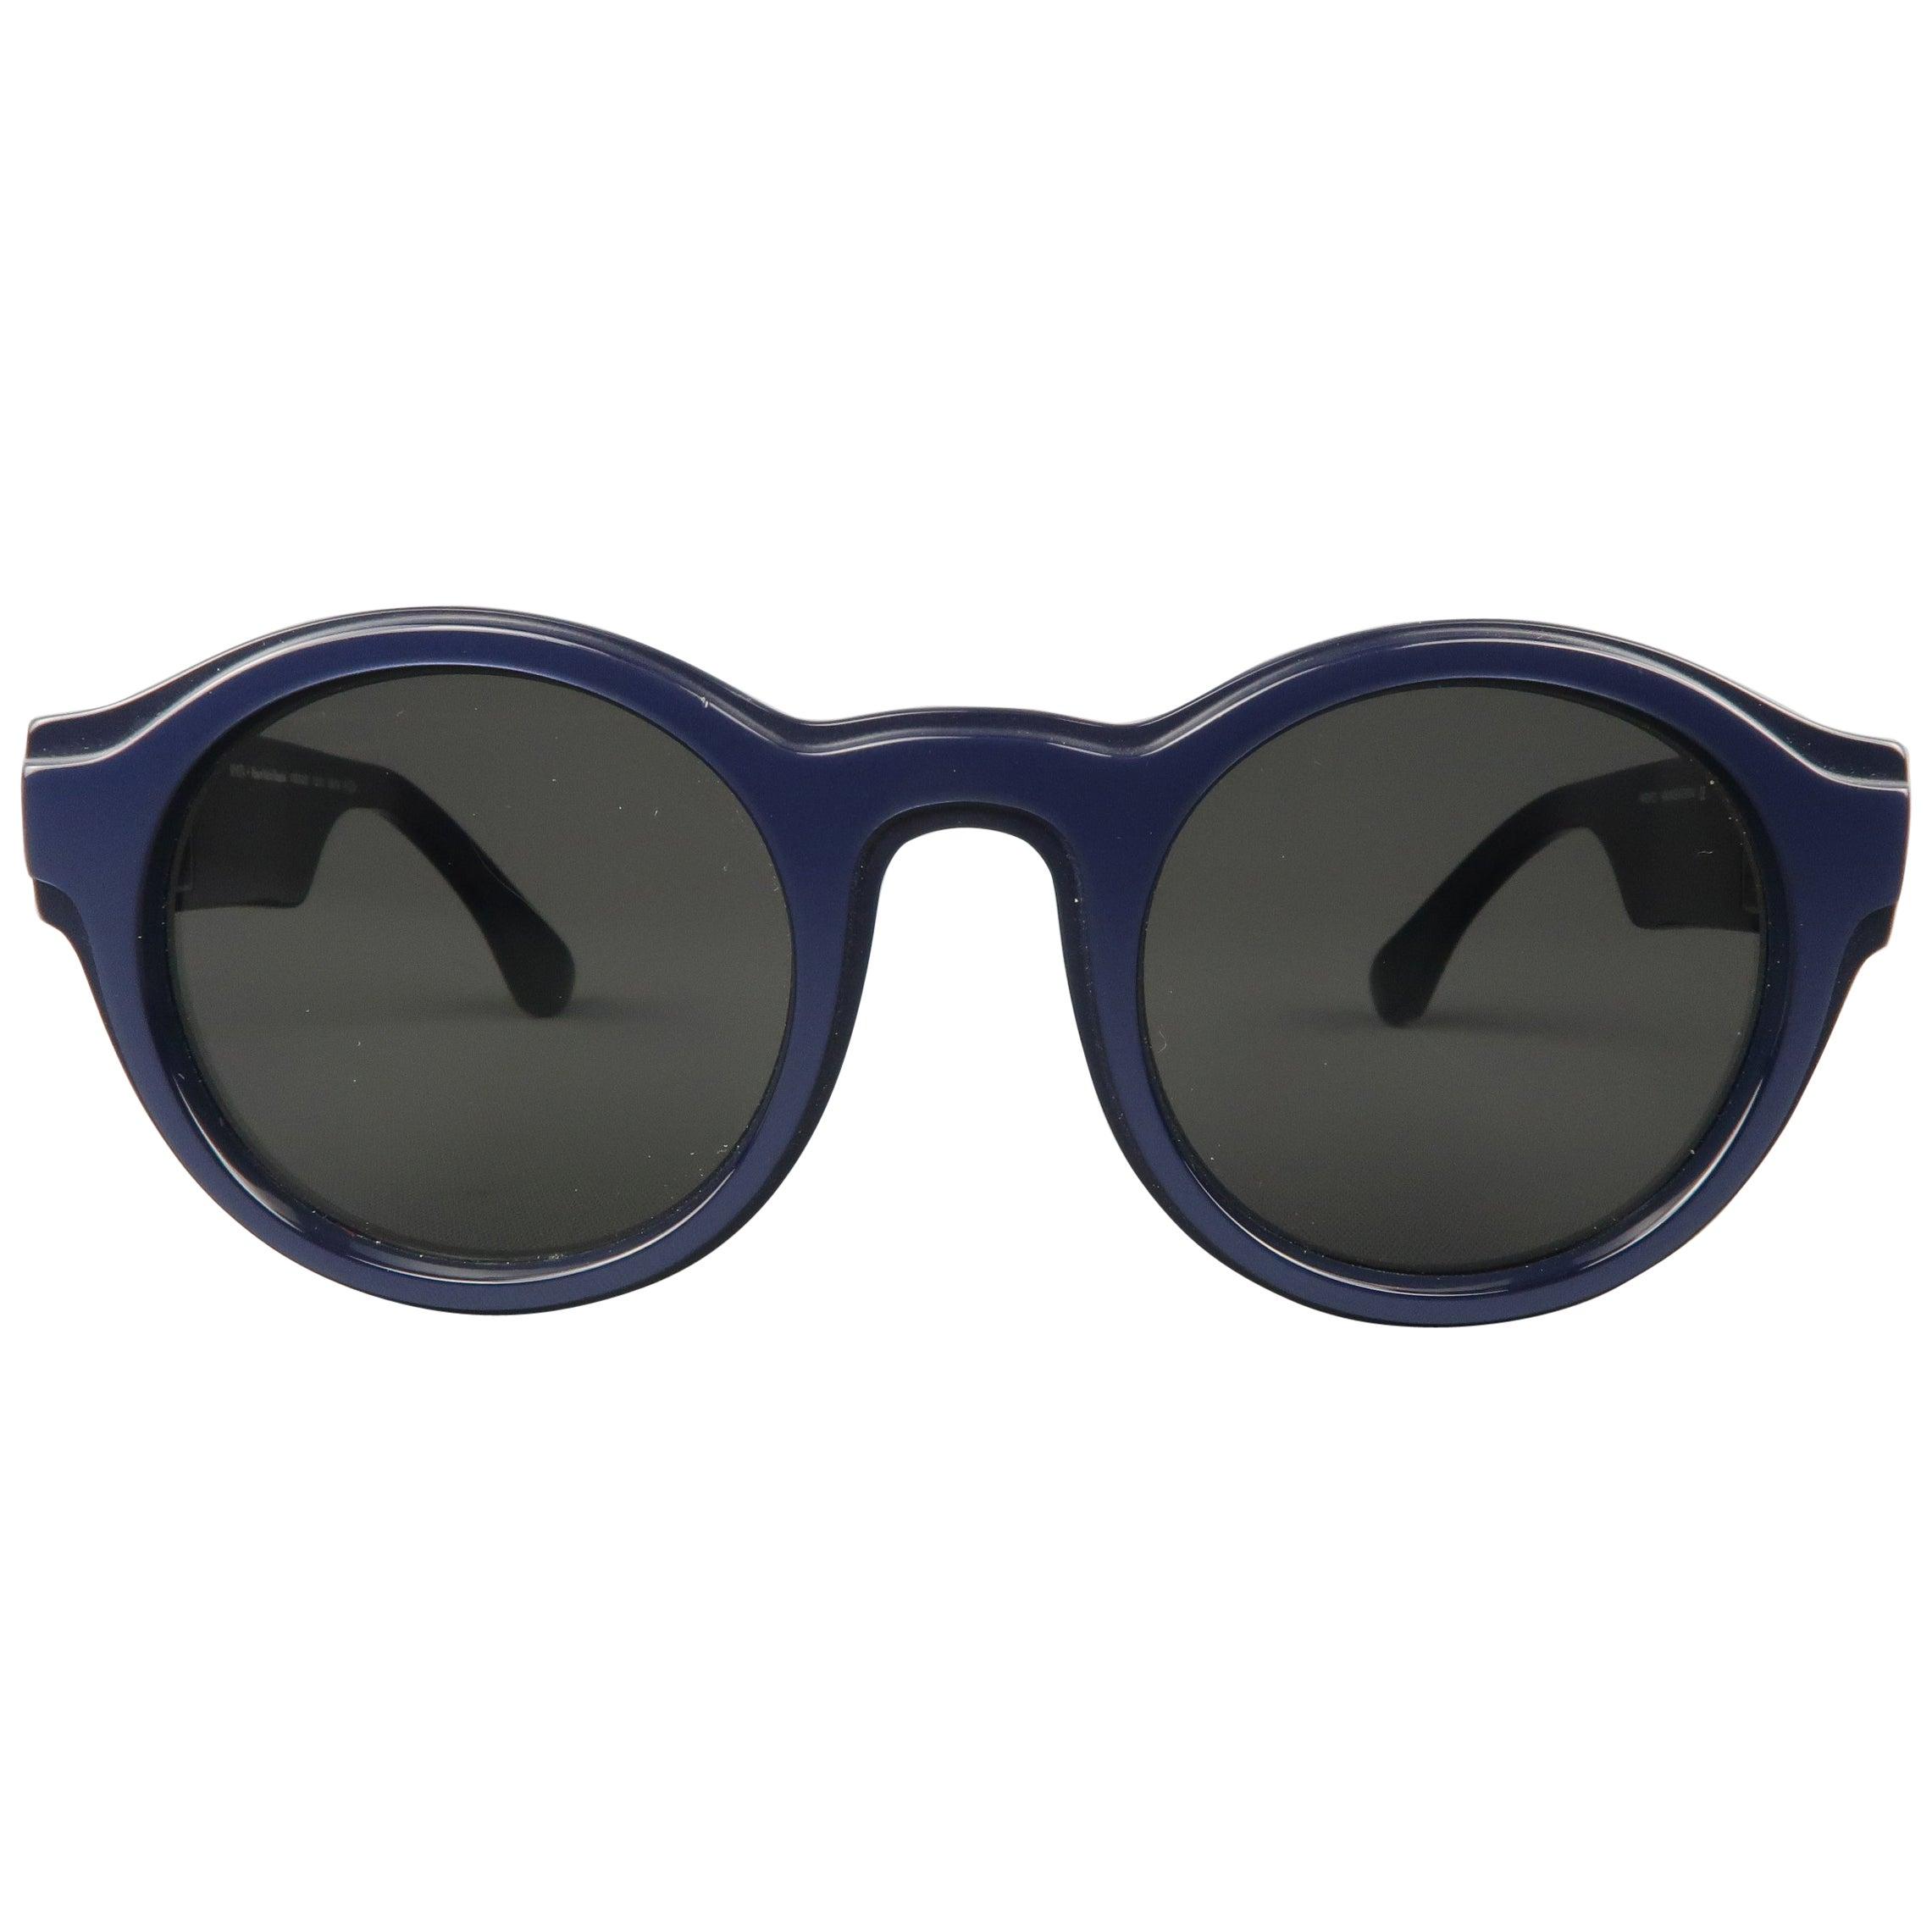 72c164992f MAISON MARTIN MARGIELA + MYKITA Navy Metallic Round MMDUAL001 Sunglasses at  1stdibs